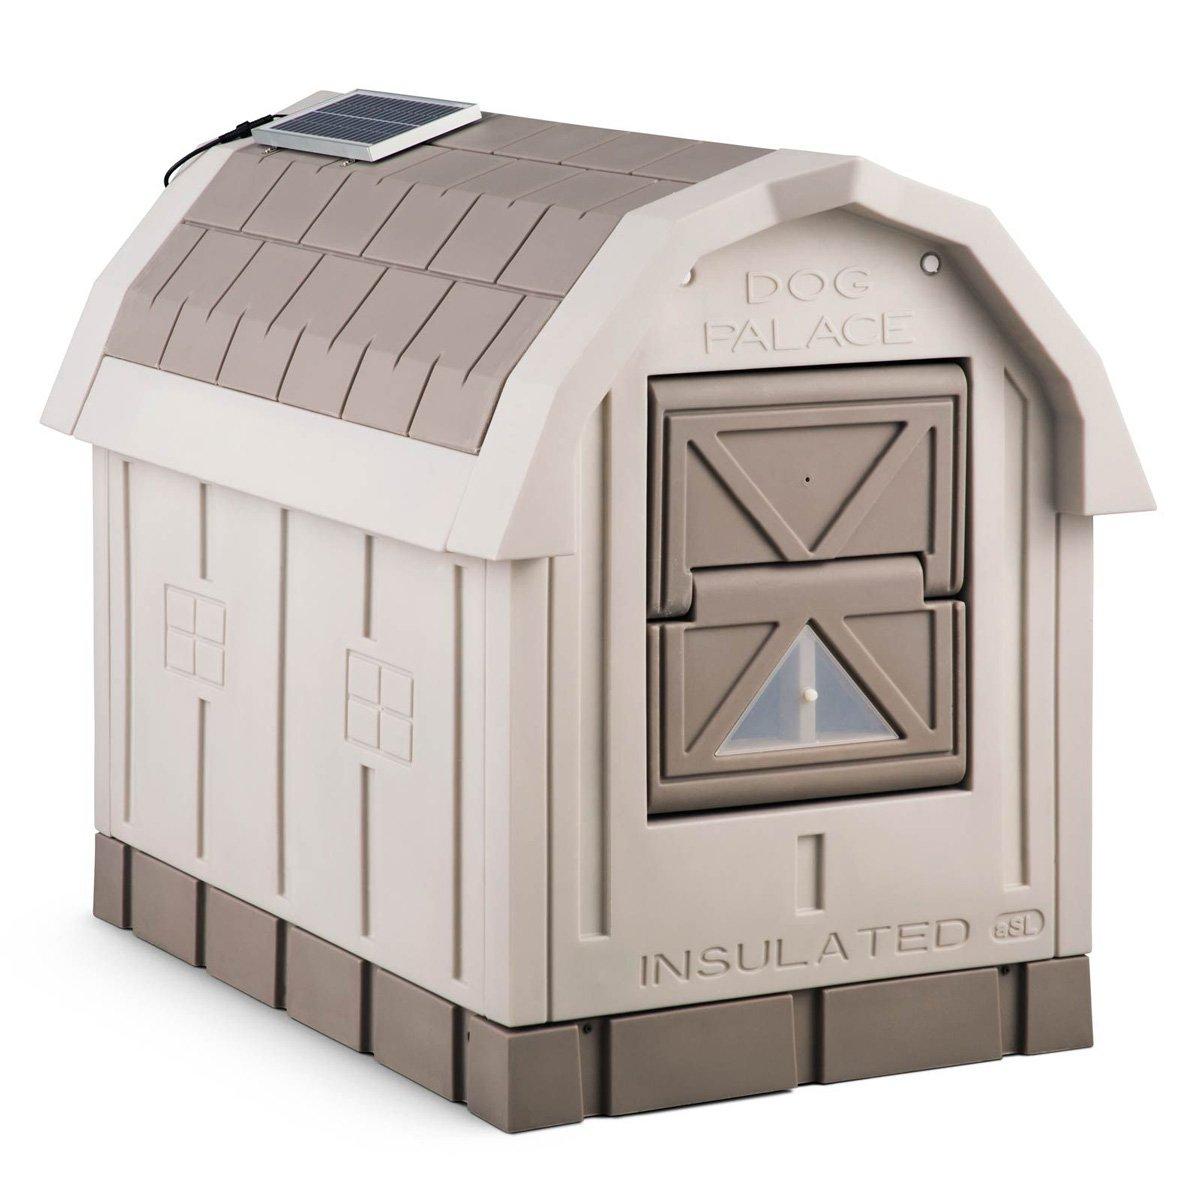 Insulated Dog House Canada